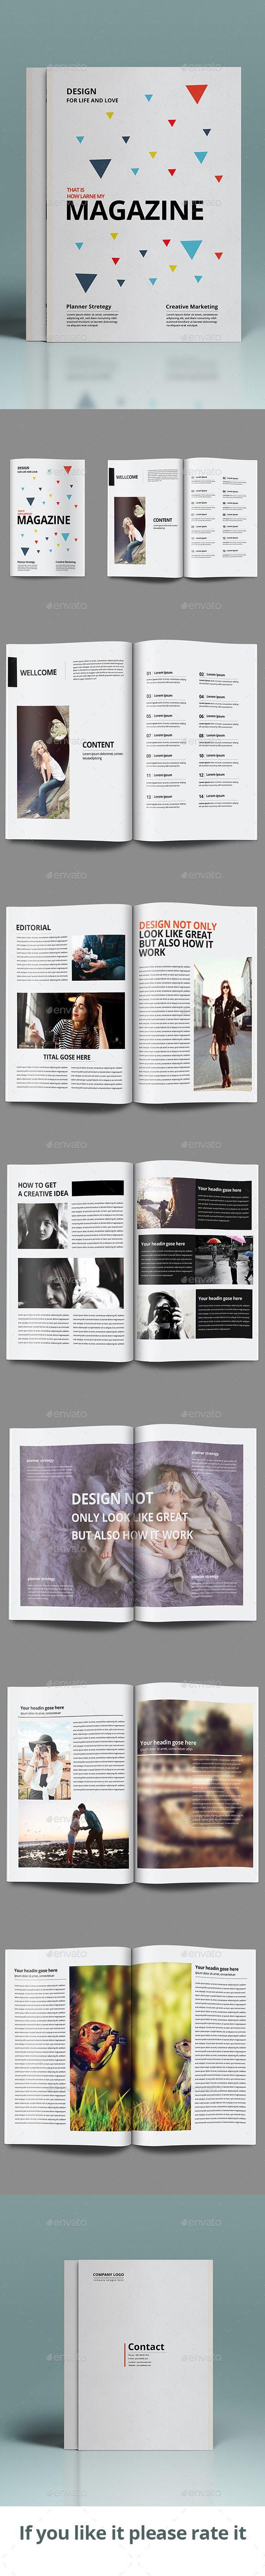 Clean Magazine Template #design #journal Download: http://graphicriver.net/item/clean-magazine-template/10827937?ref=ksioks